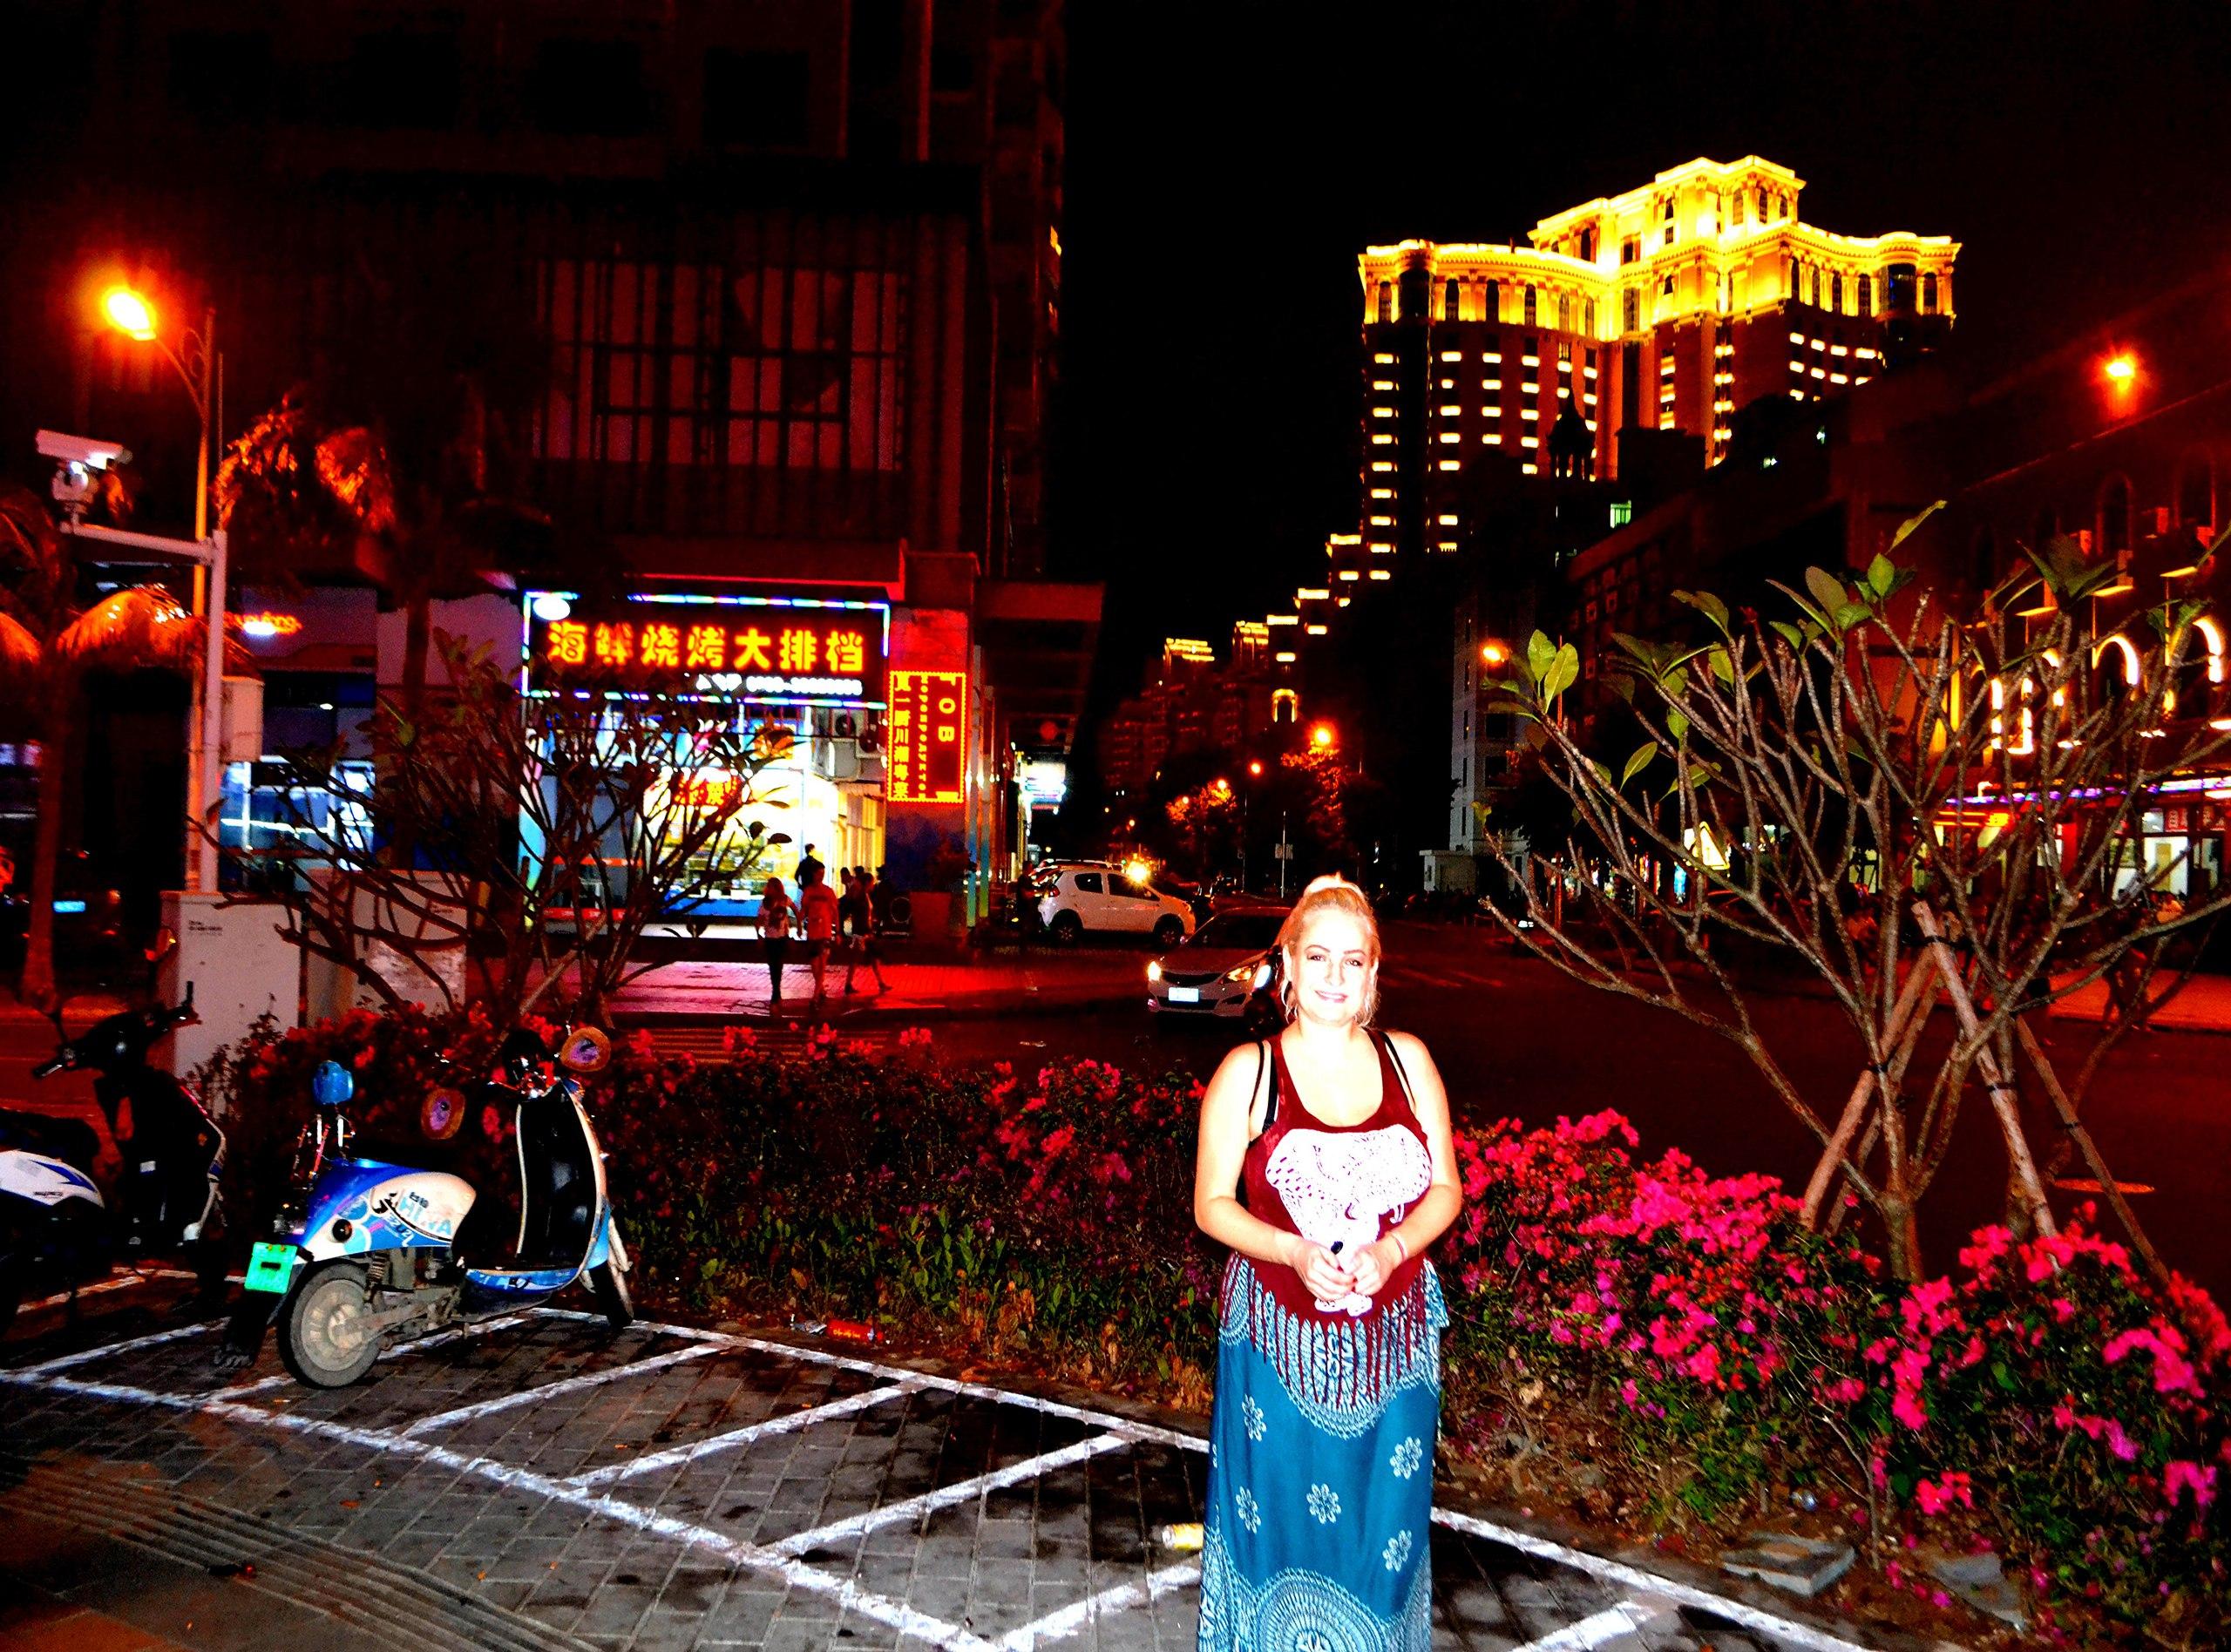 Елена Руденко (Валтея). Китай, о.Хайнань, г.Санья. (фото) - Страница 2 K_yI1BnnKKk